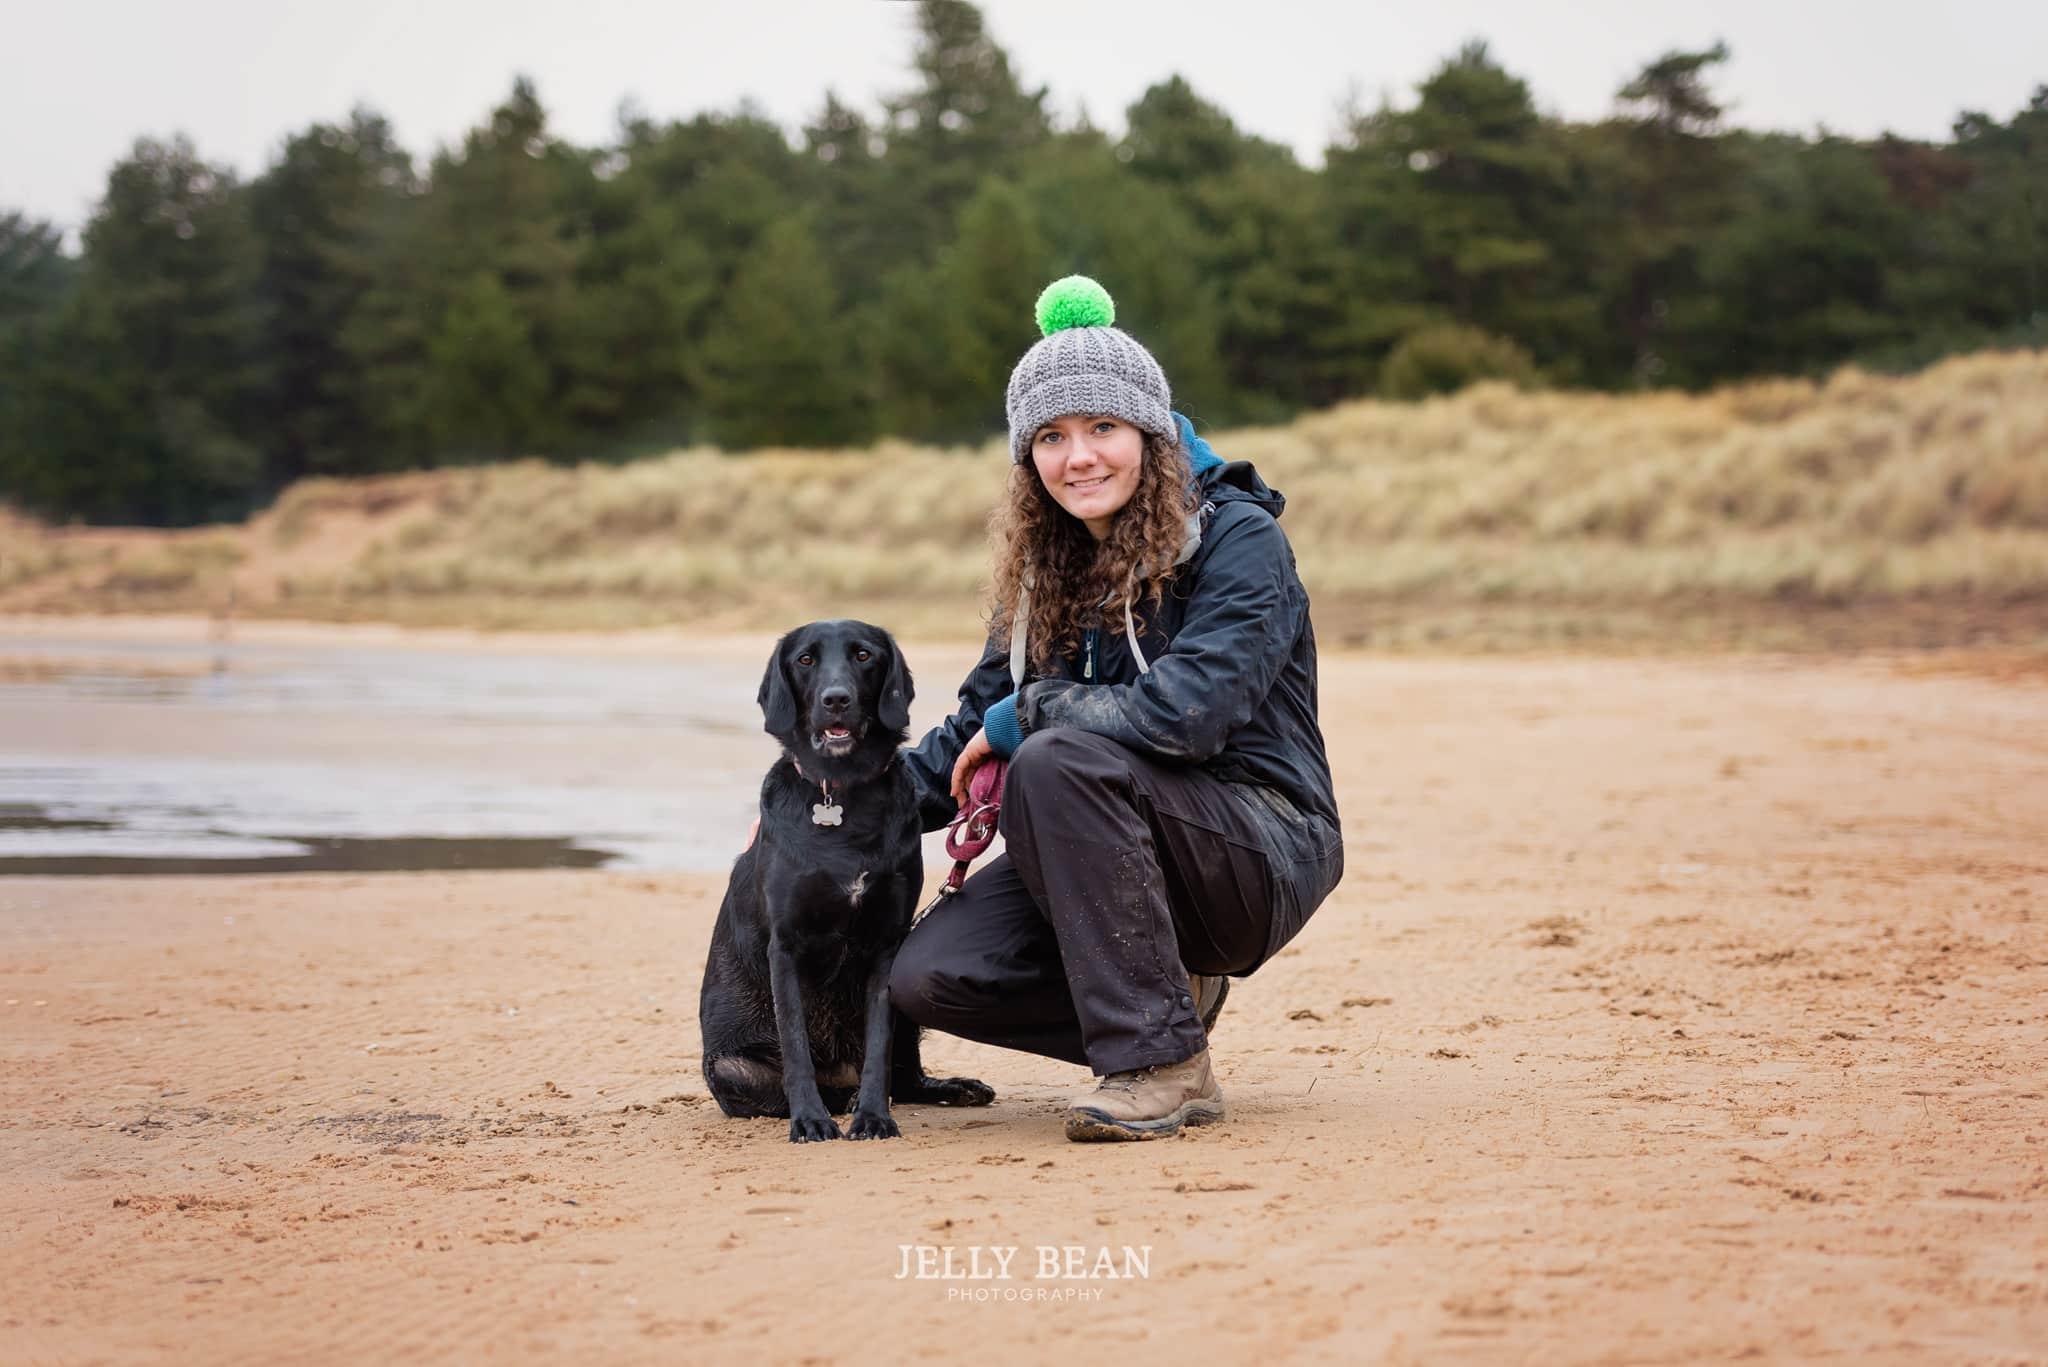 Girl with black dog on the beach